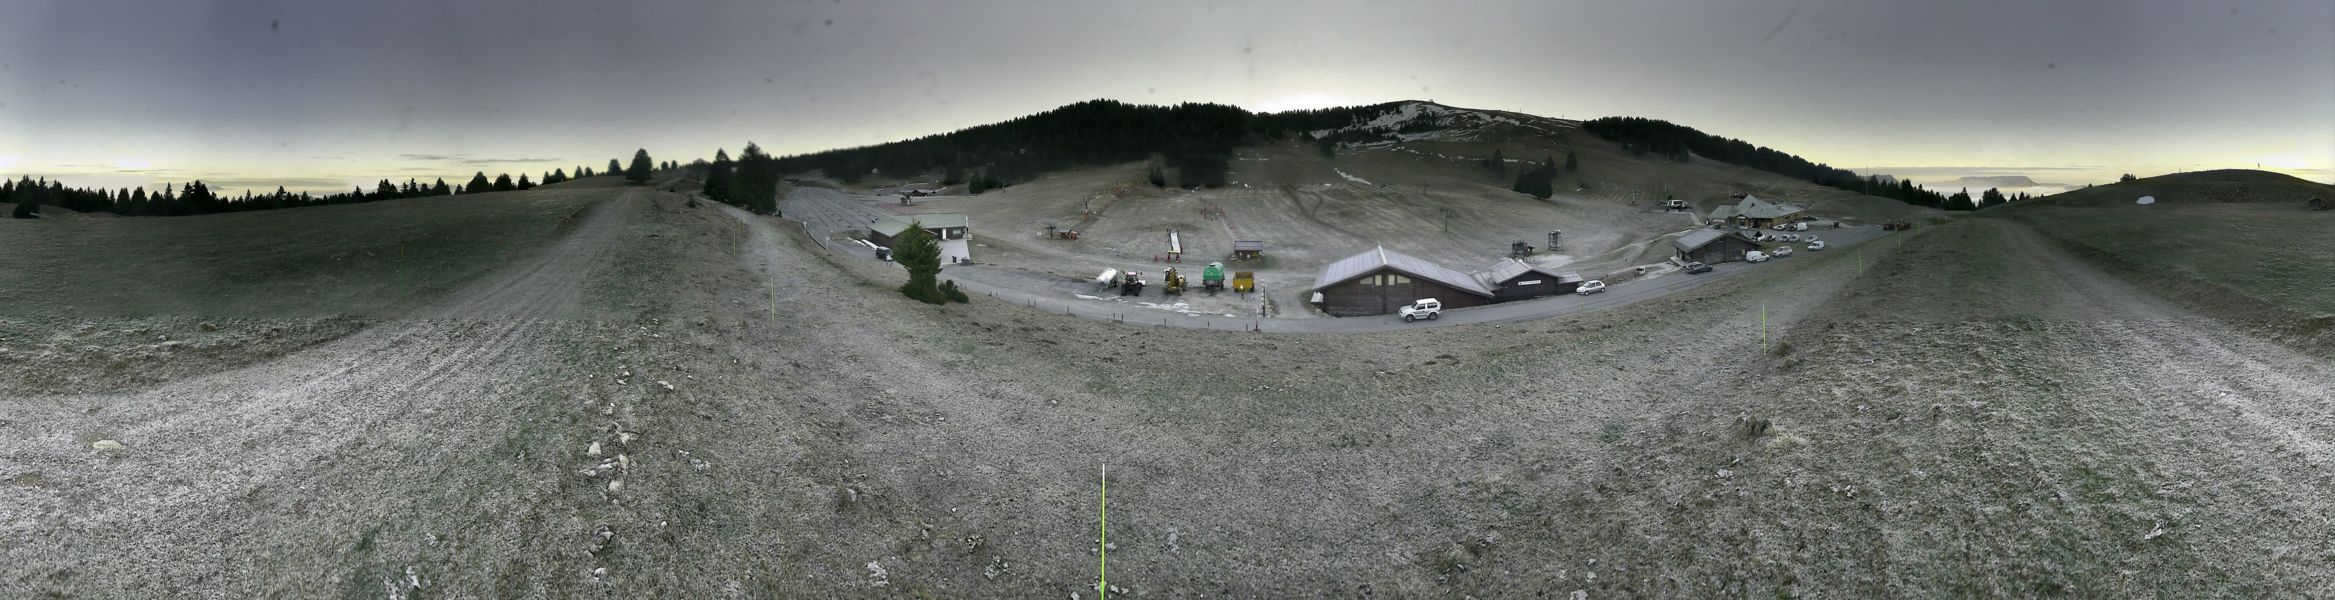 Leschaux Semnoz Panorama